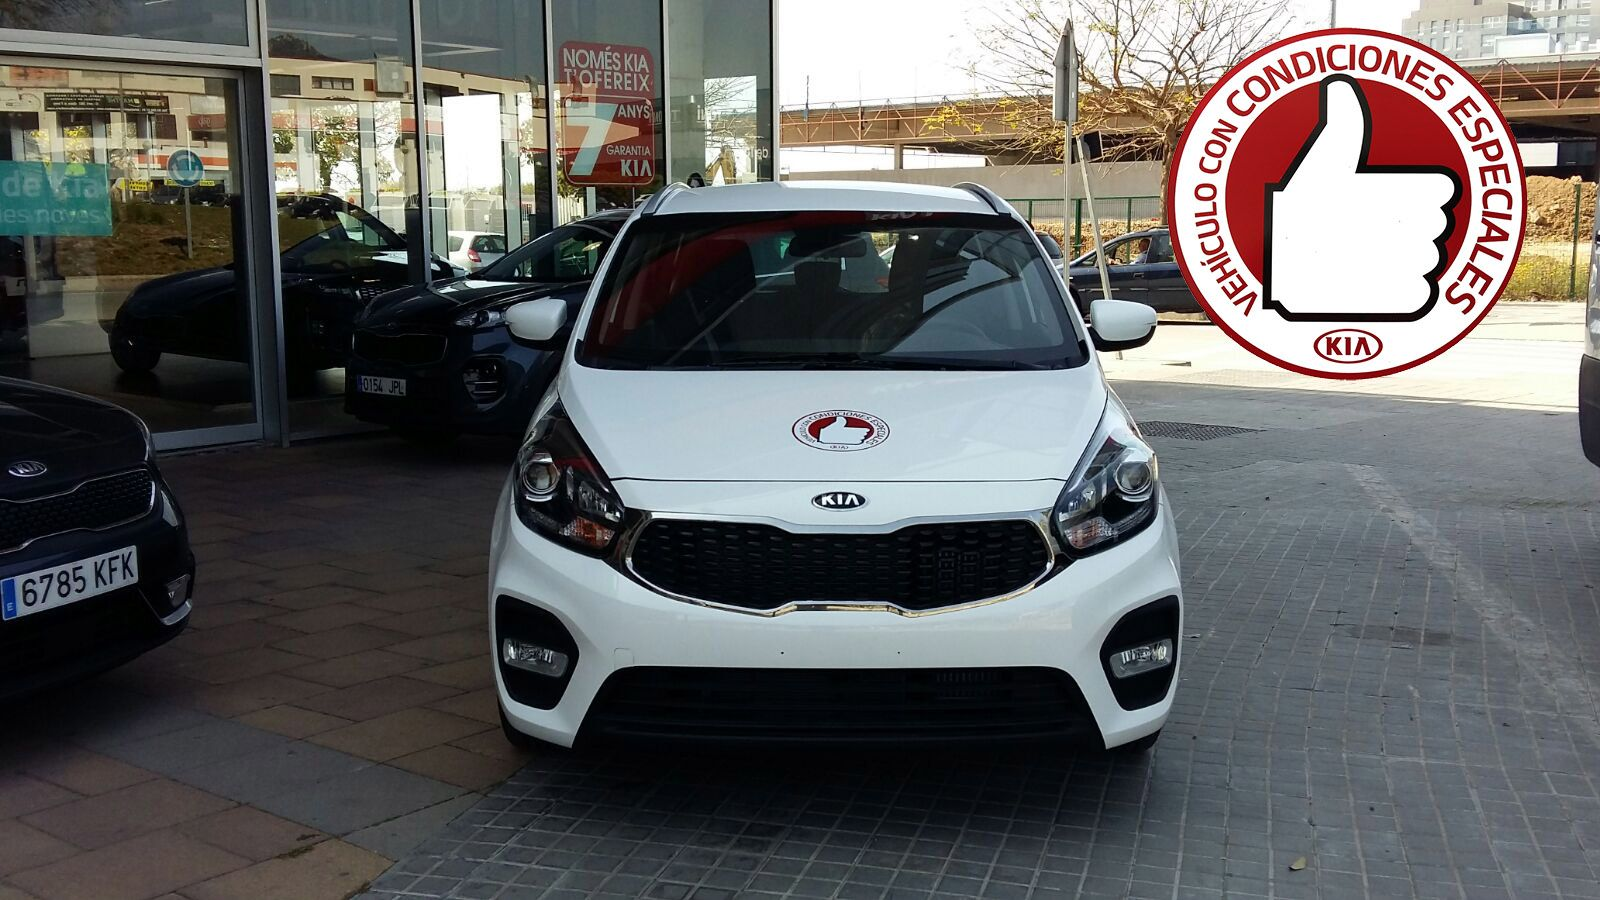 Kia Carens 1.7 CRDi Business Red Label por 17.250*